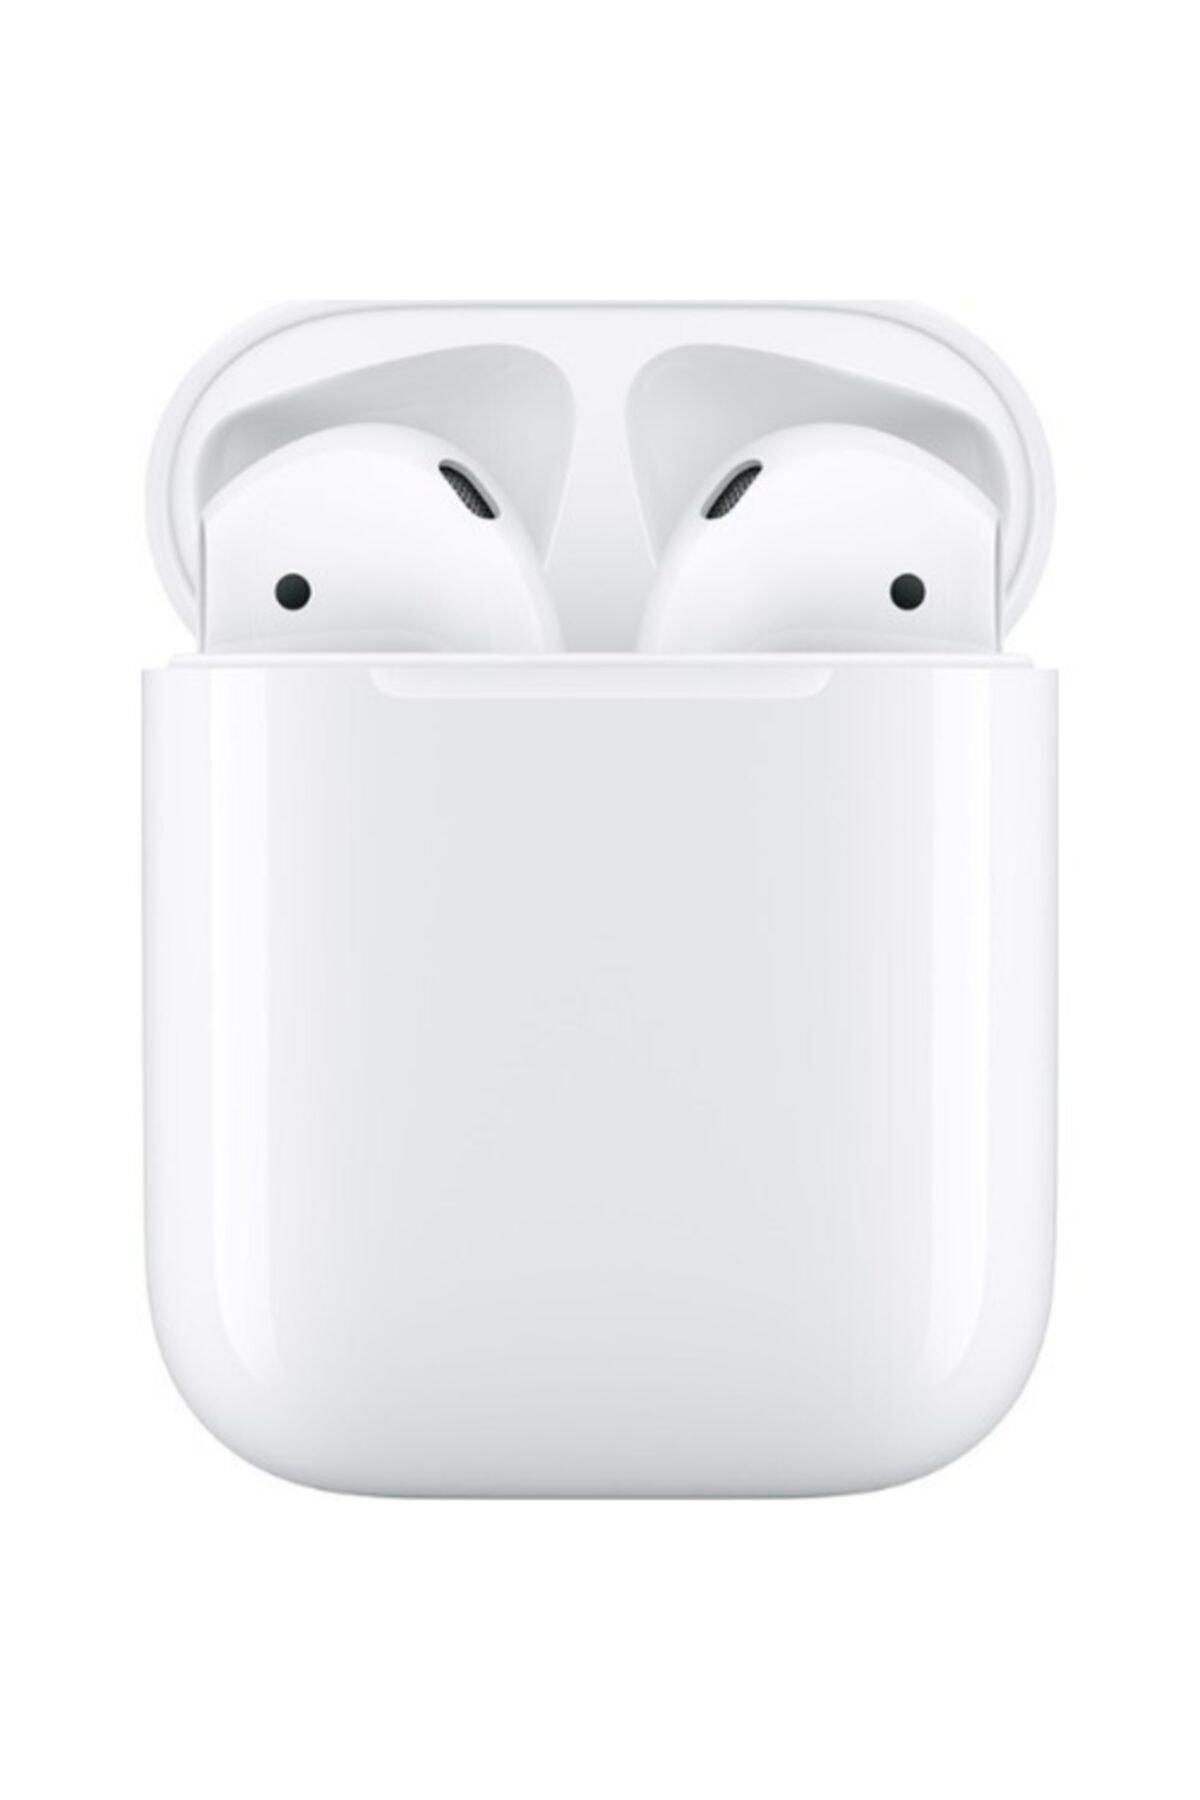 Apple Airpods 2. Nesil Bluetooth Kulaklık Mv7n2tu/a ( Apple Türkiye Garantili) 1